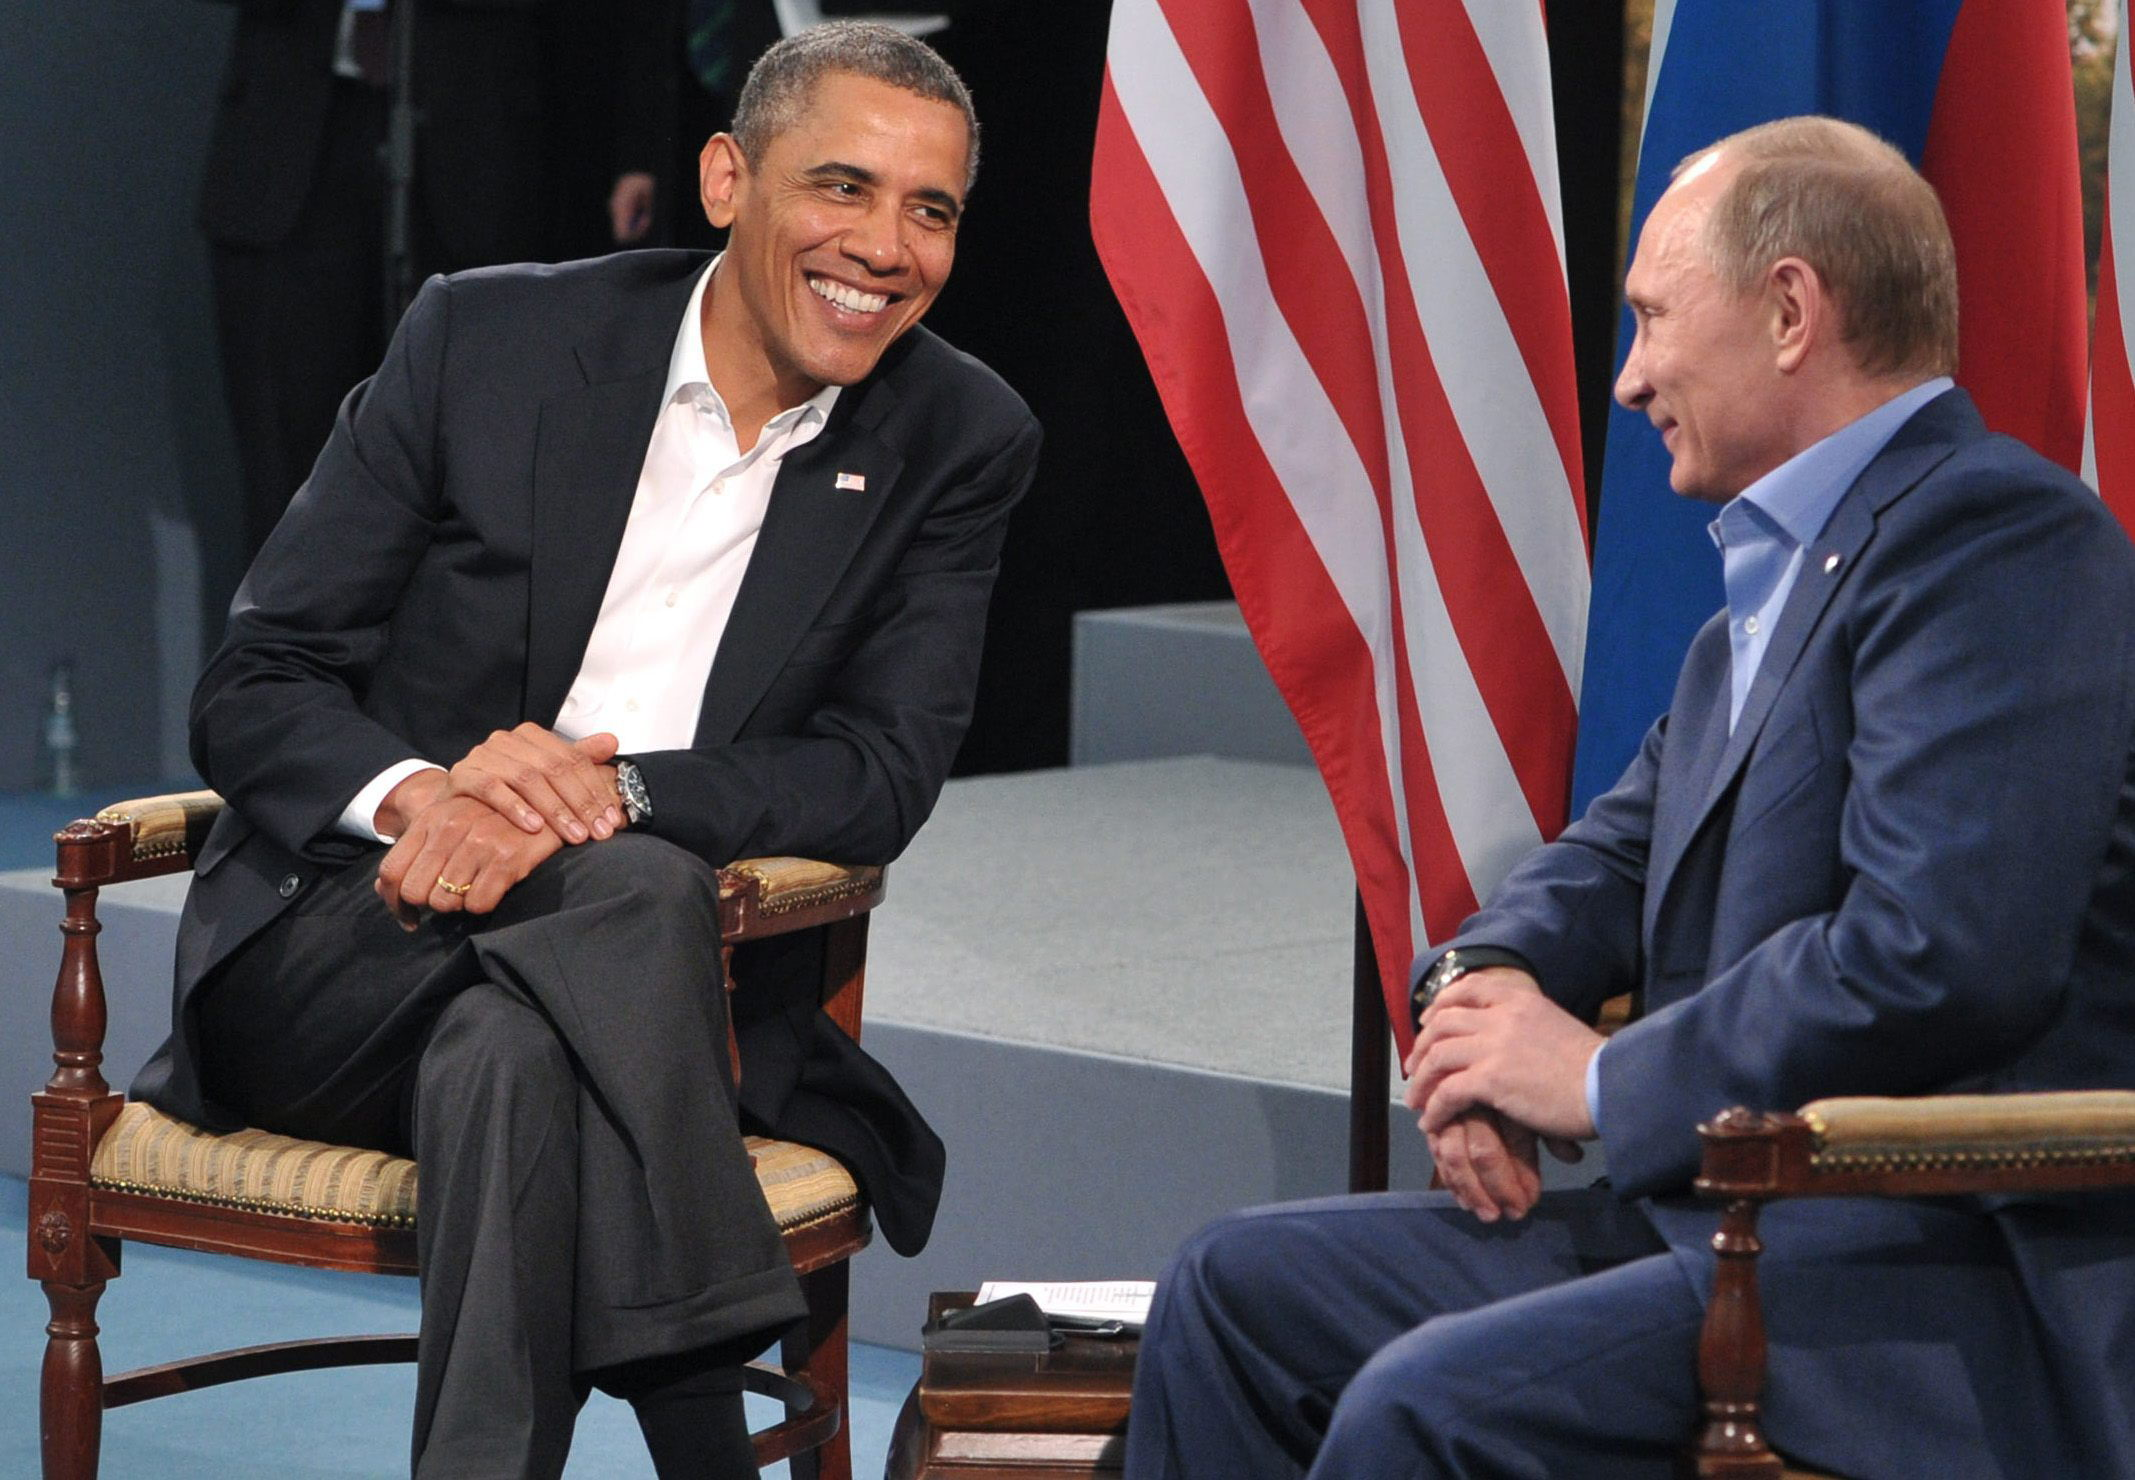 La cumbre del G8 se reanuda para tratar de la lucha antiterrorista